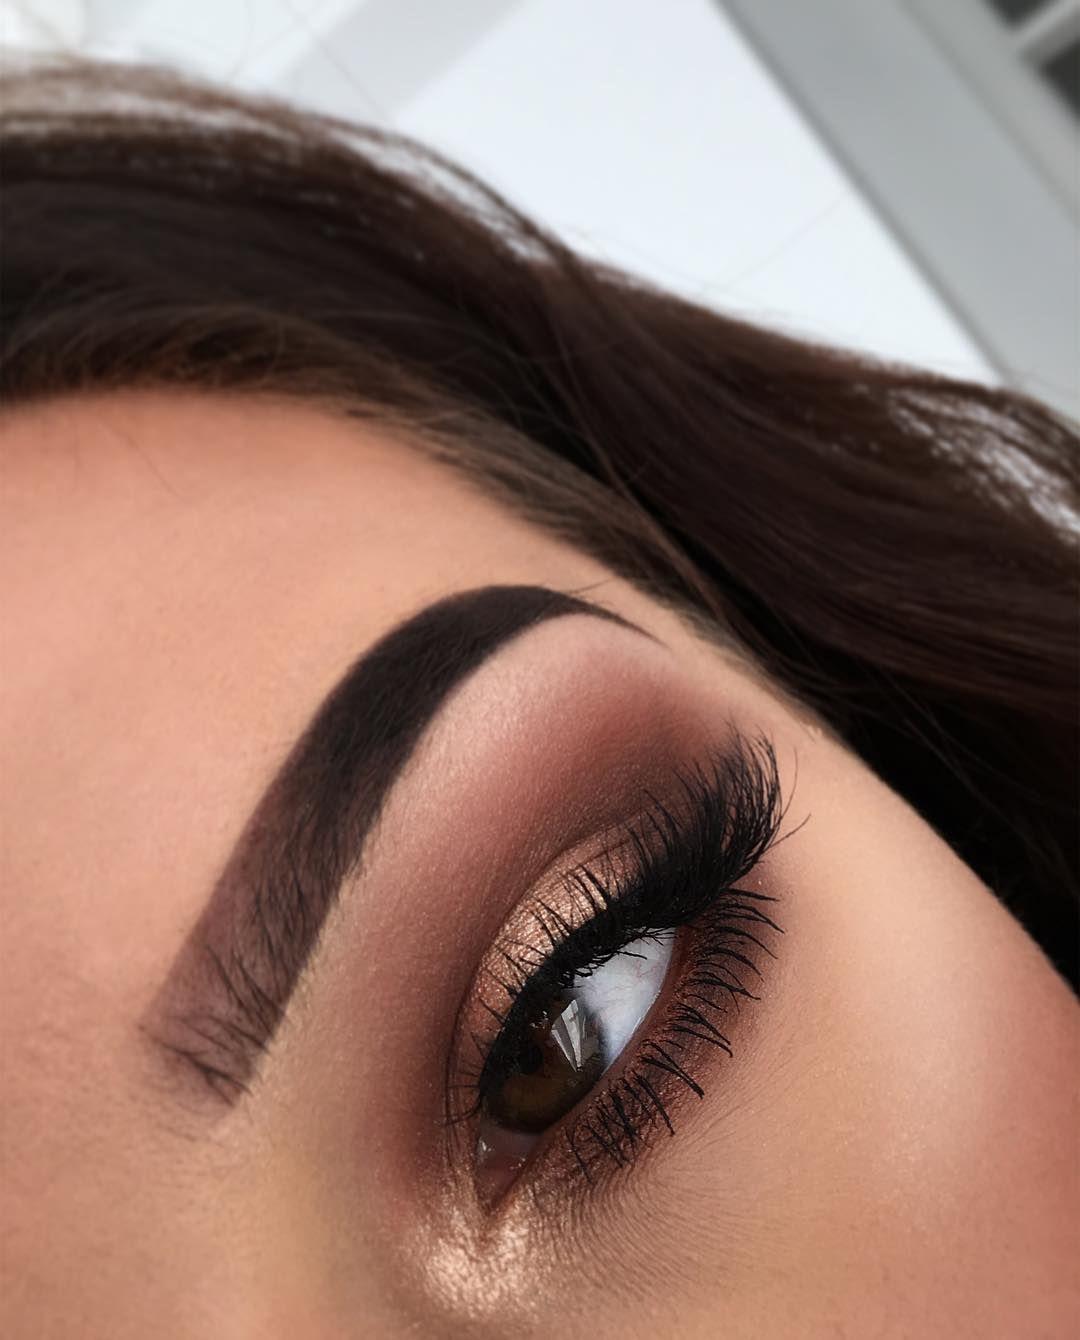 Look - Makeup eye Simple tumblr pictures video